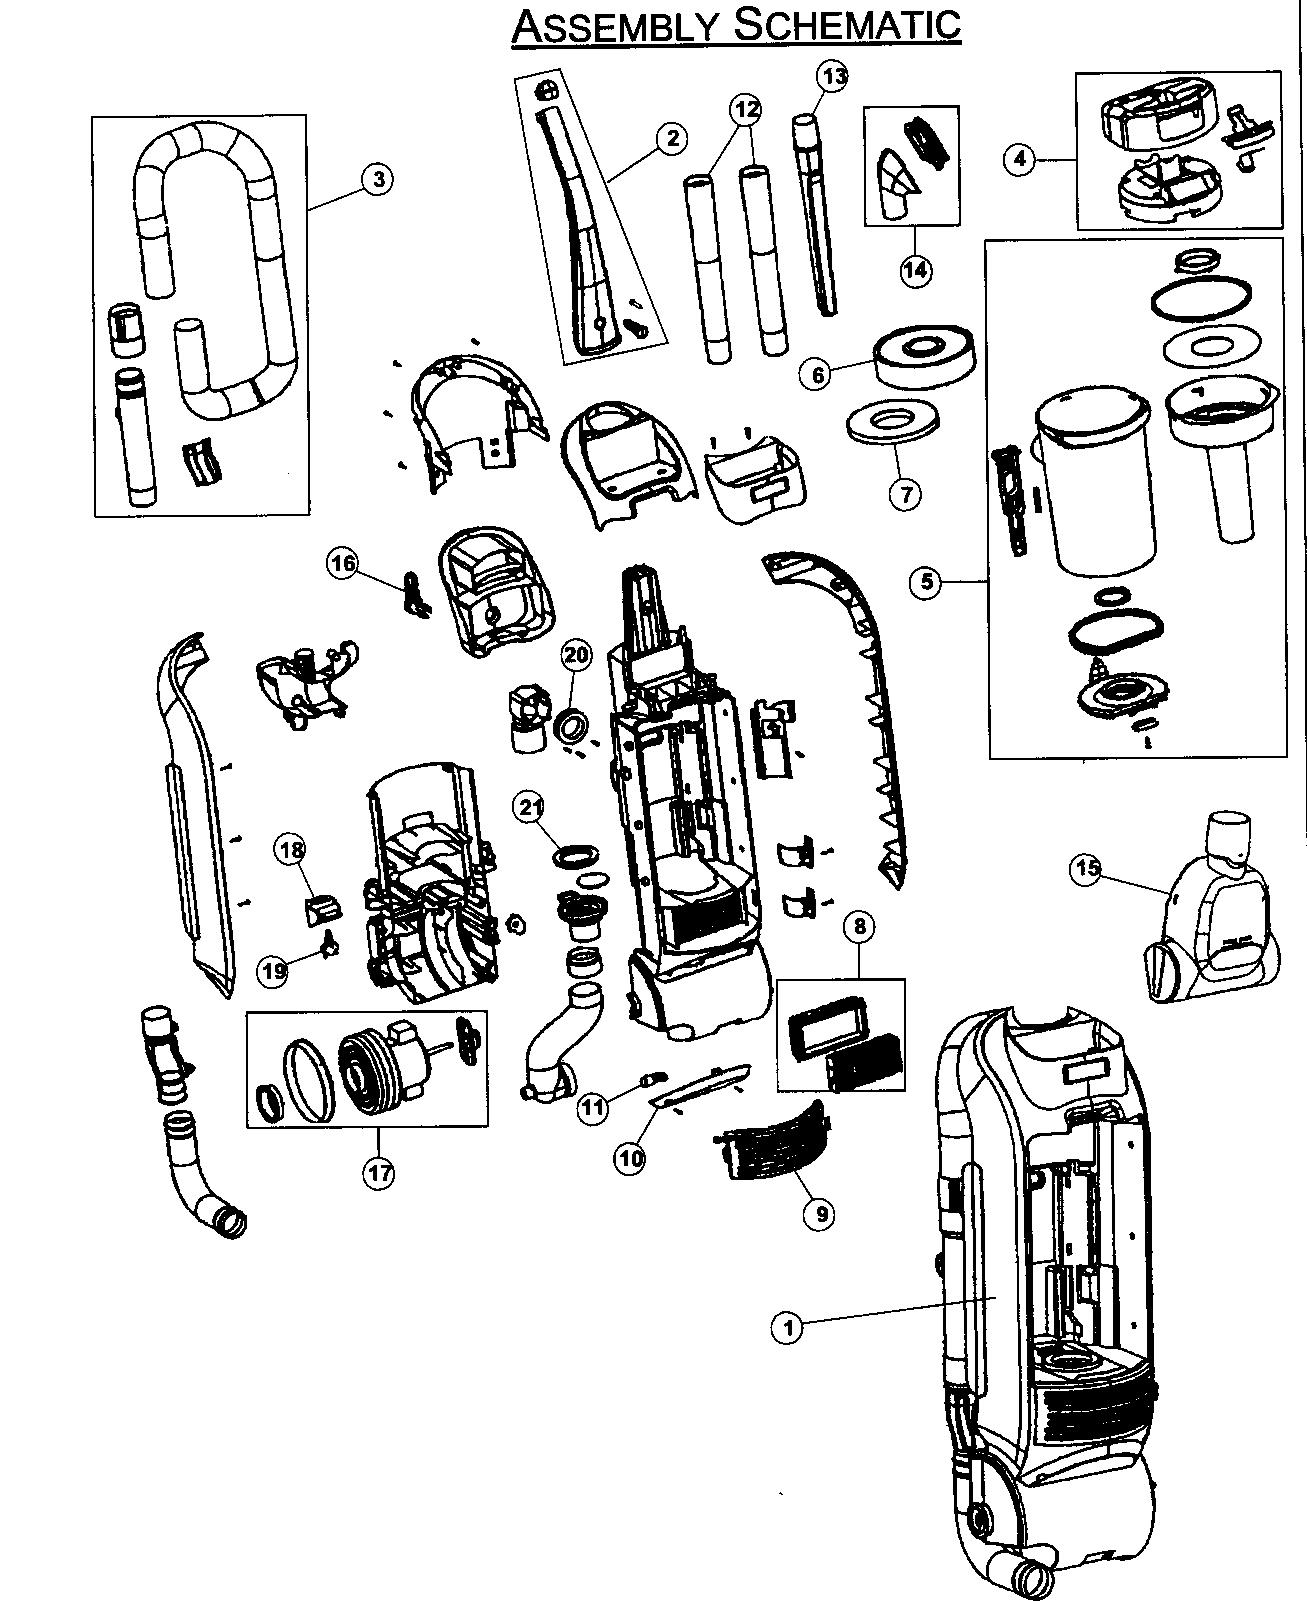 Kenmore model 21637010800 vacuum, upright genuine parts